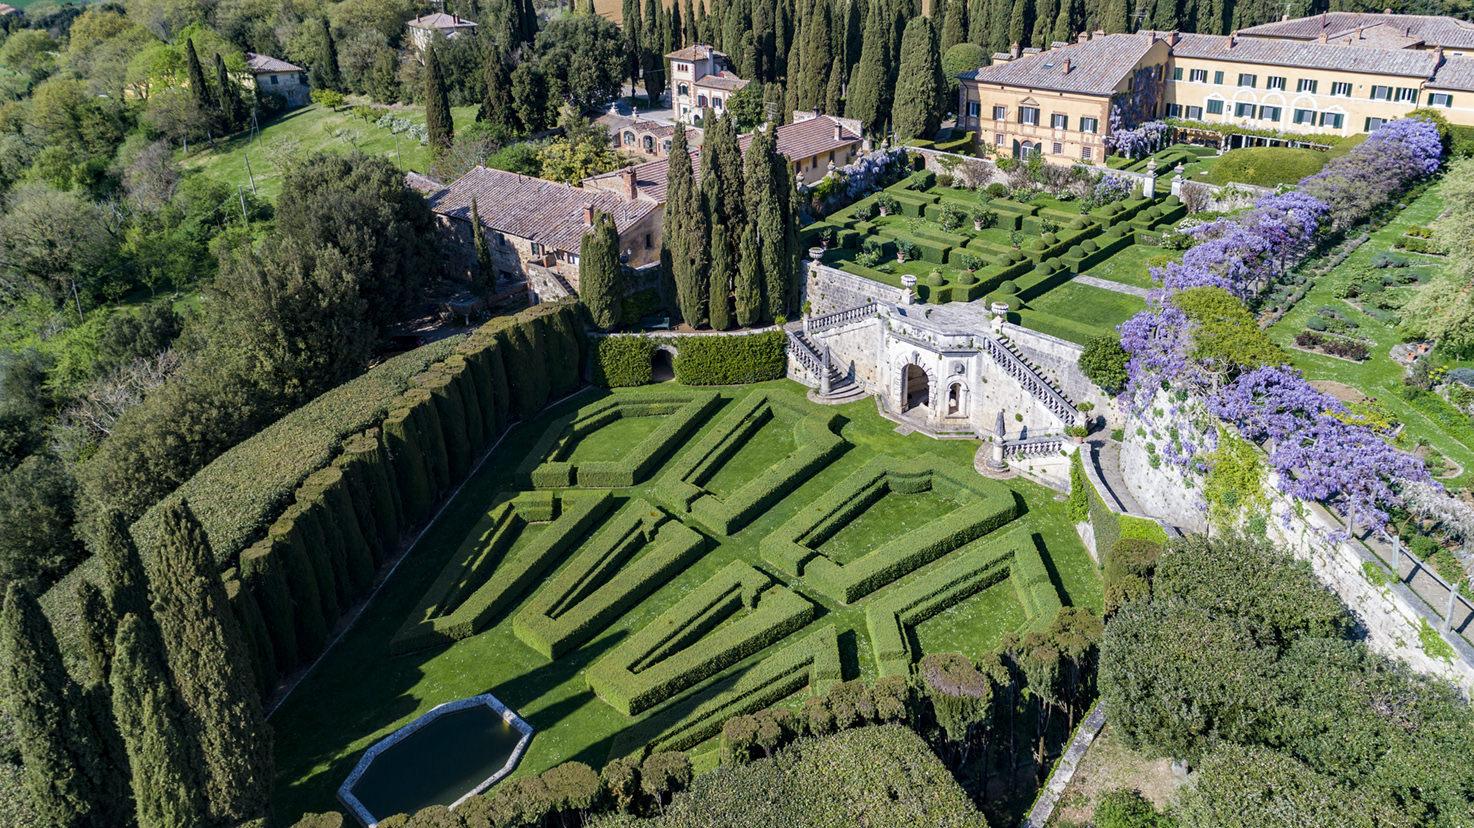 Overview of Villa La Foce